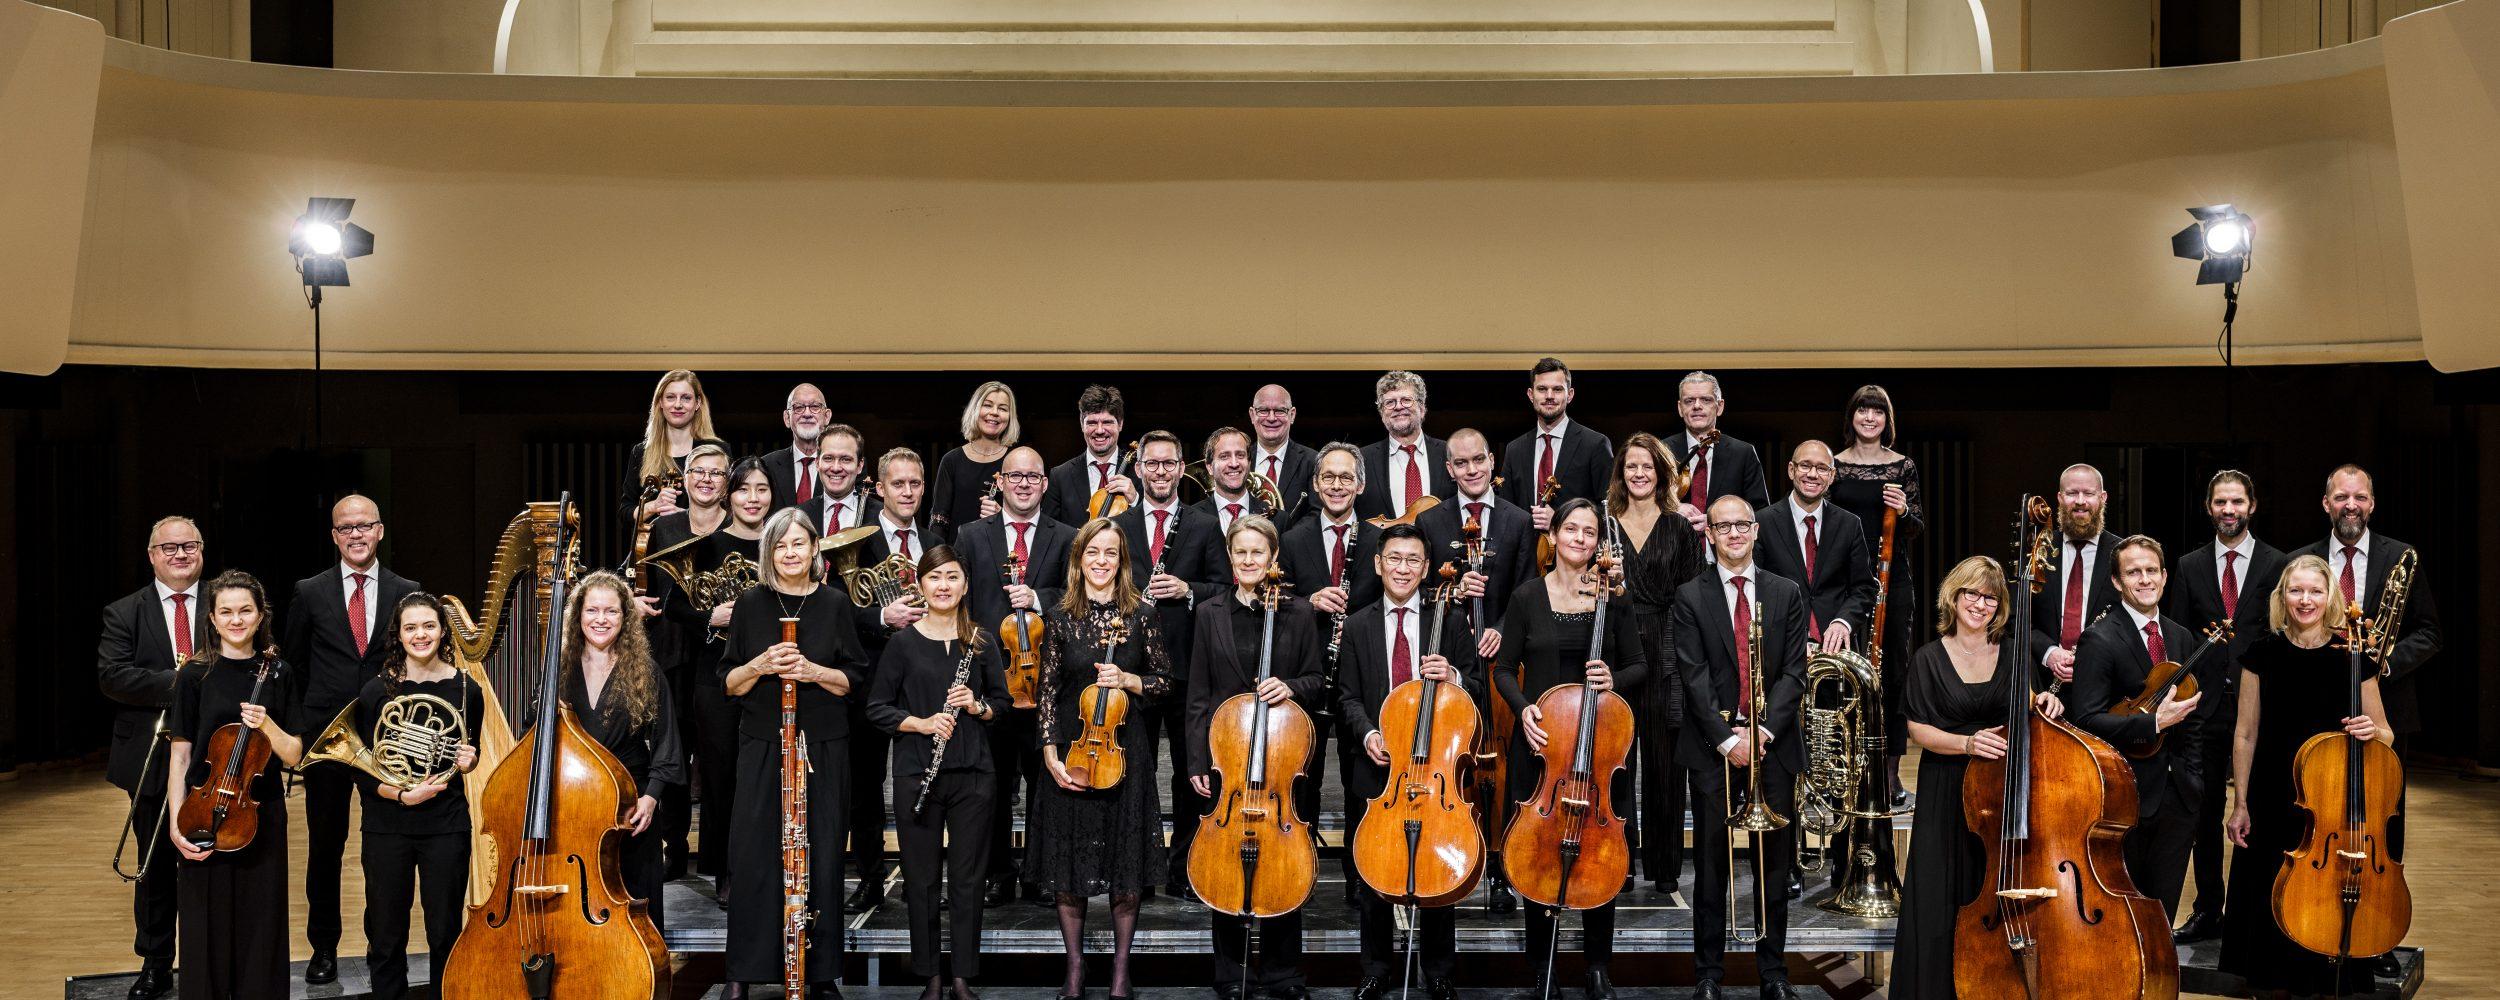 Norrlandsoperans_Symfoniorkester